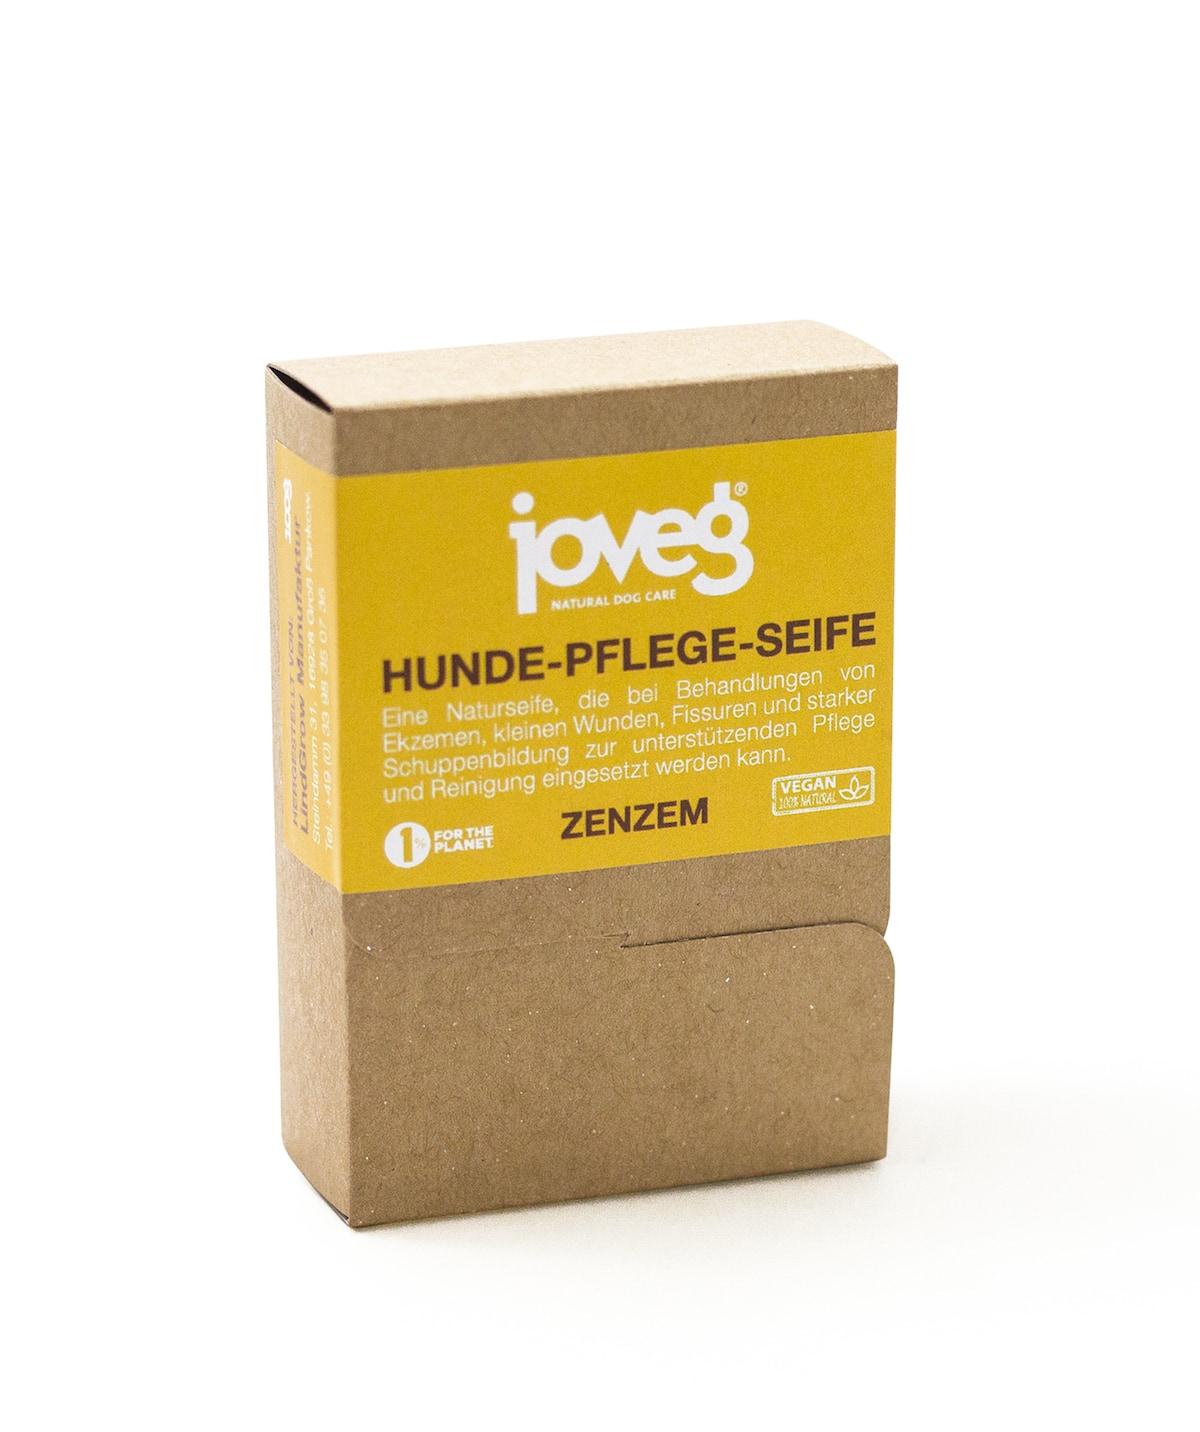 "joveg Hunde-Pflege-Seife ""ZENZEM"" 100 g"